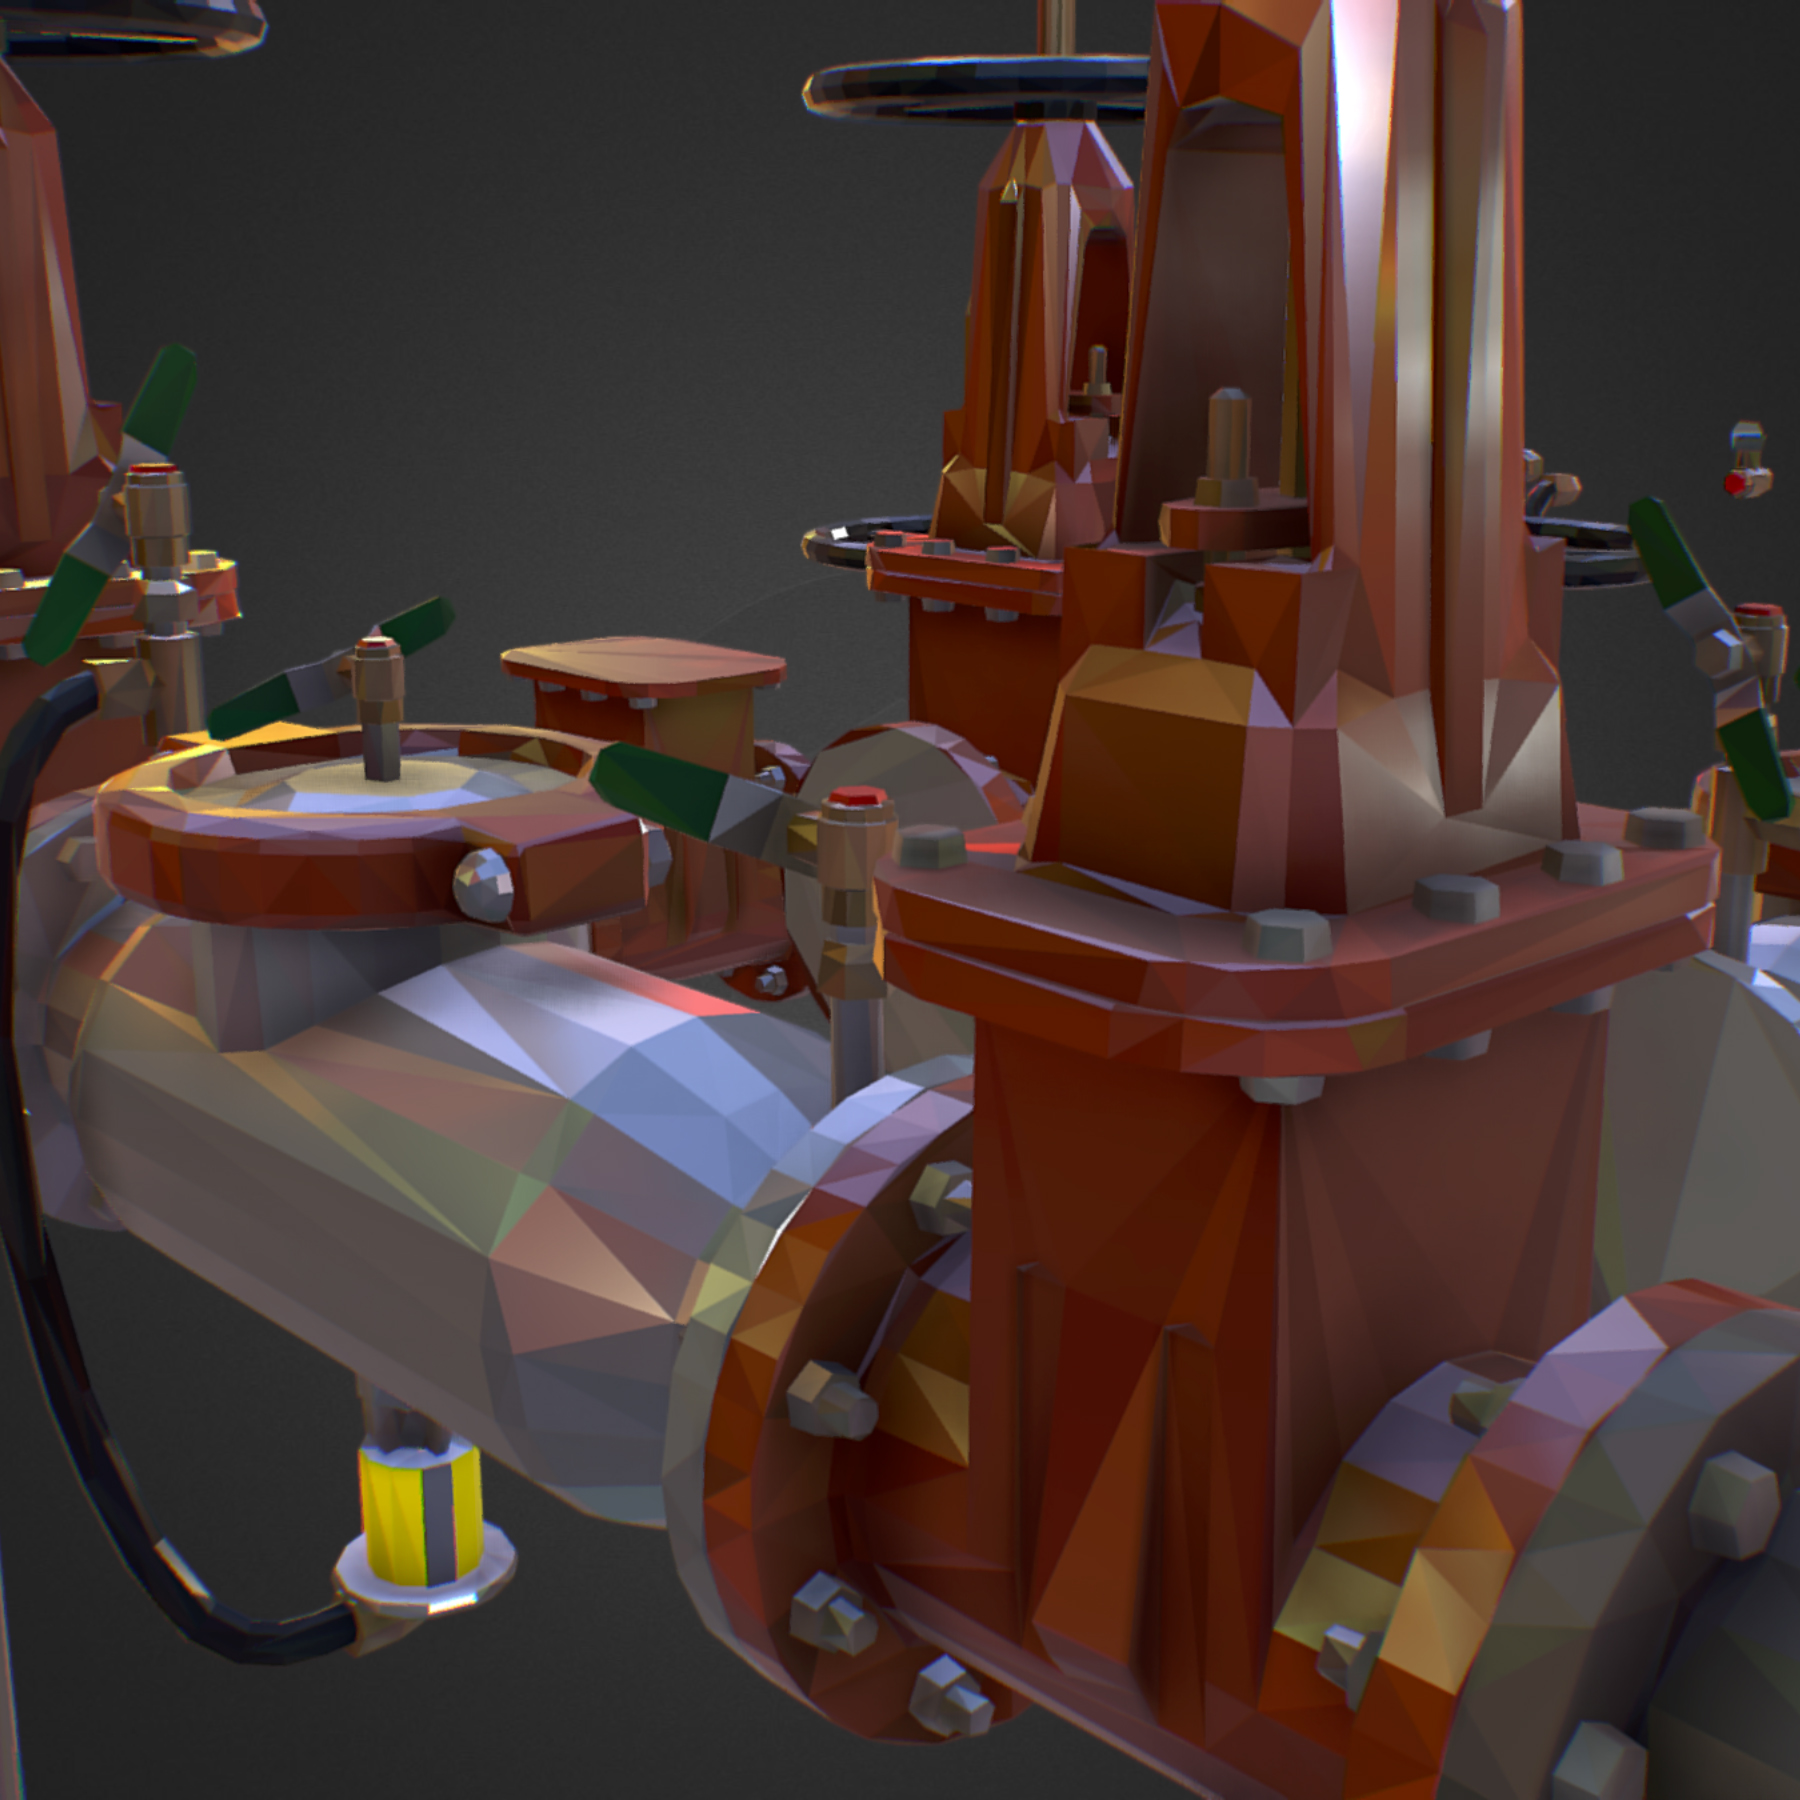 Low Poly ART Backflow Water Pipe Constructor 3d model max 3ds max plugin fbx ma mb tga targa icb vda vst pix obj 272556